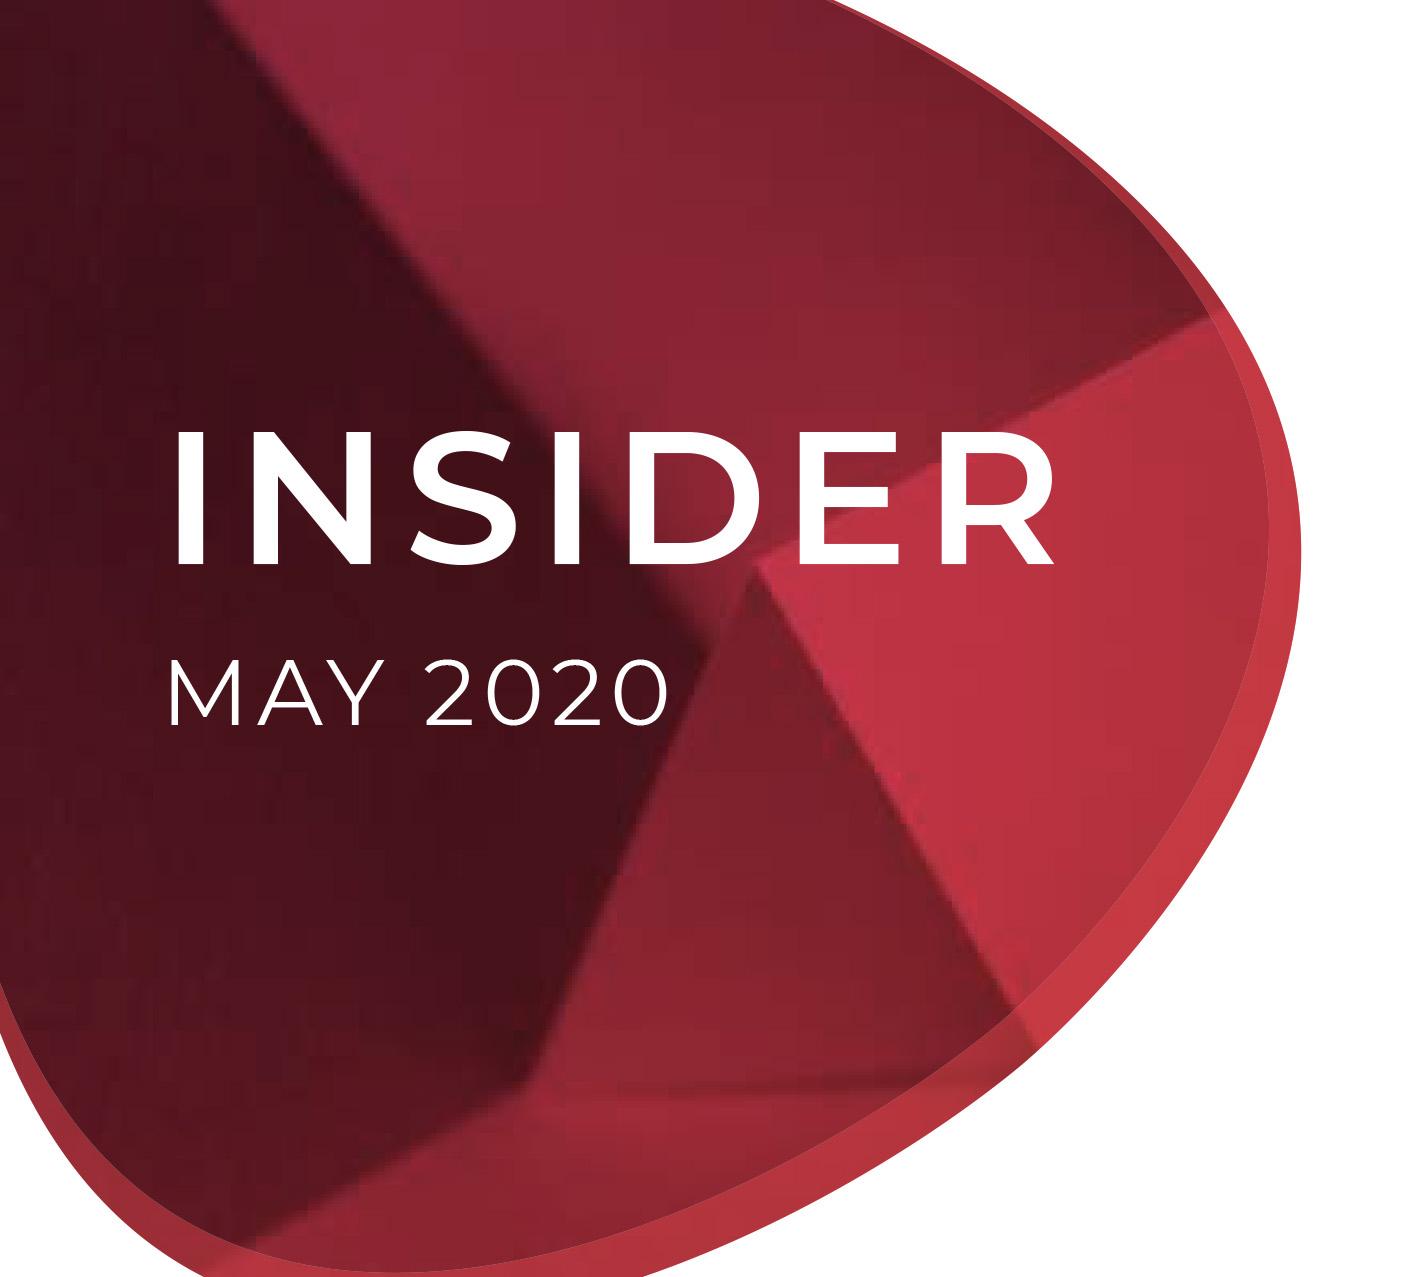 May Insider 2020 - ADPL LLP